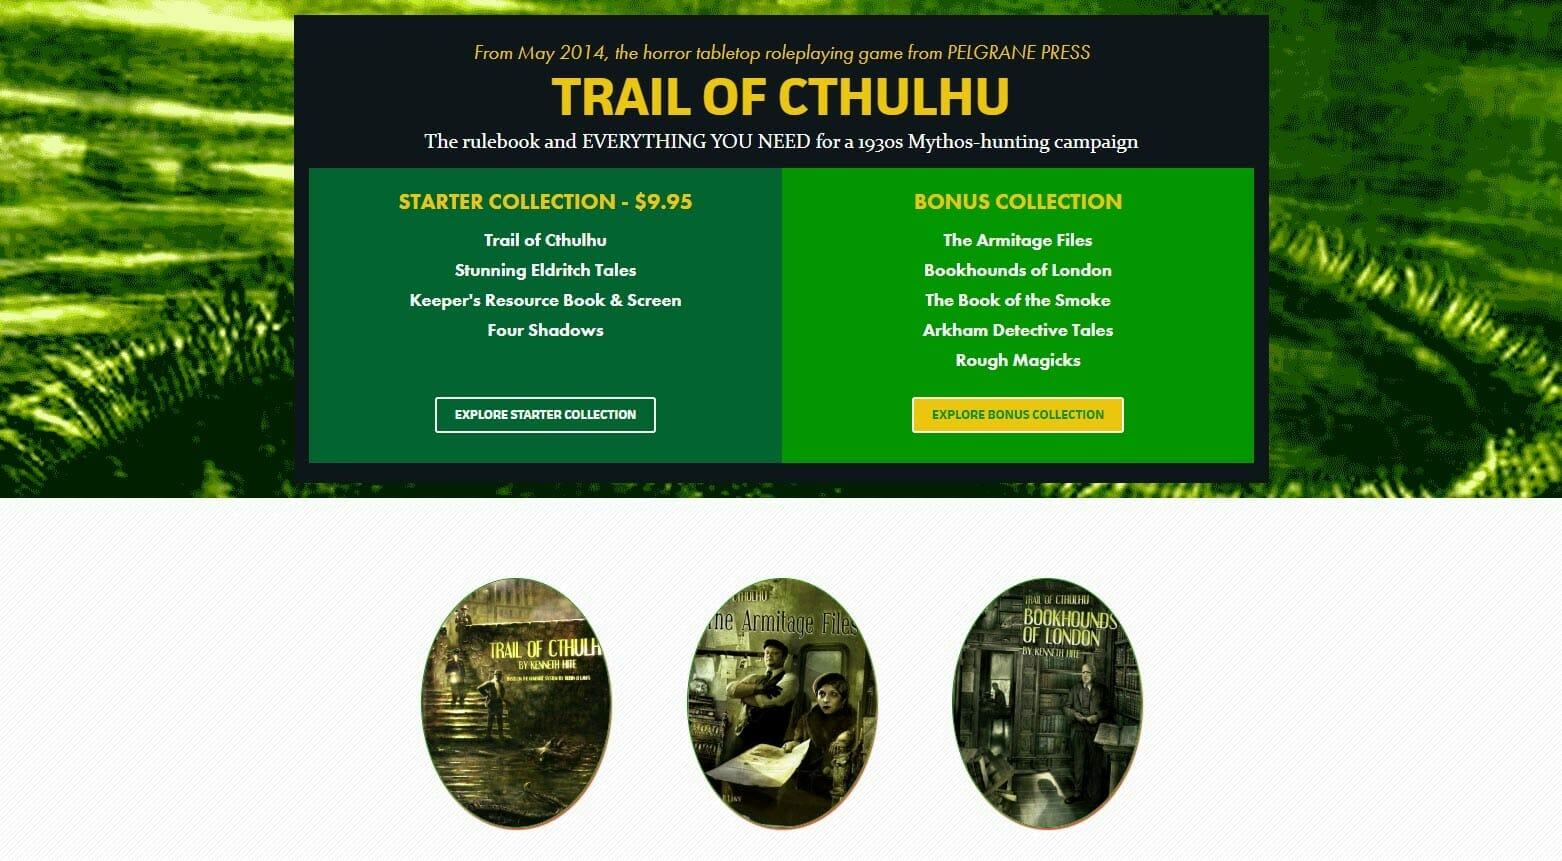 Trail of Cthulhu humble bundle